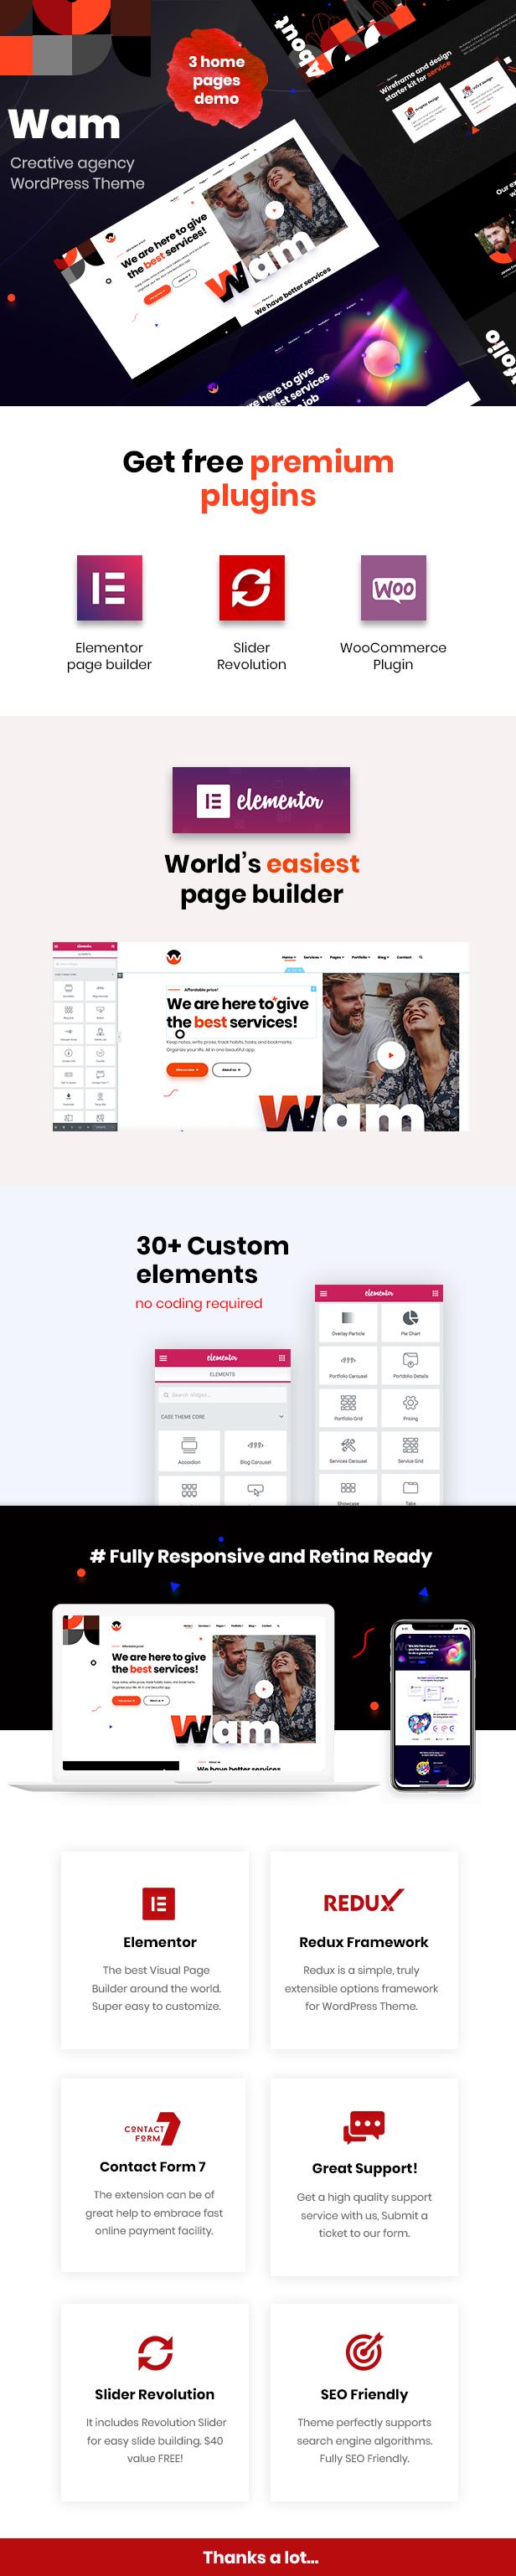 Wam - Creative Agency WordPress